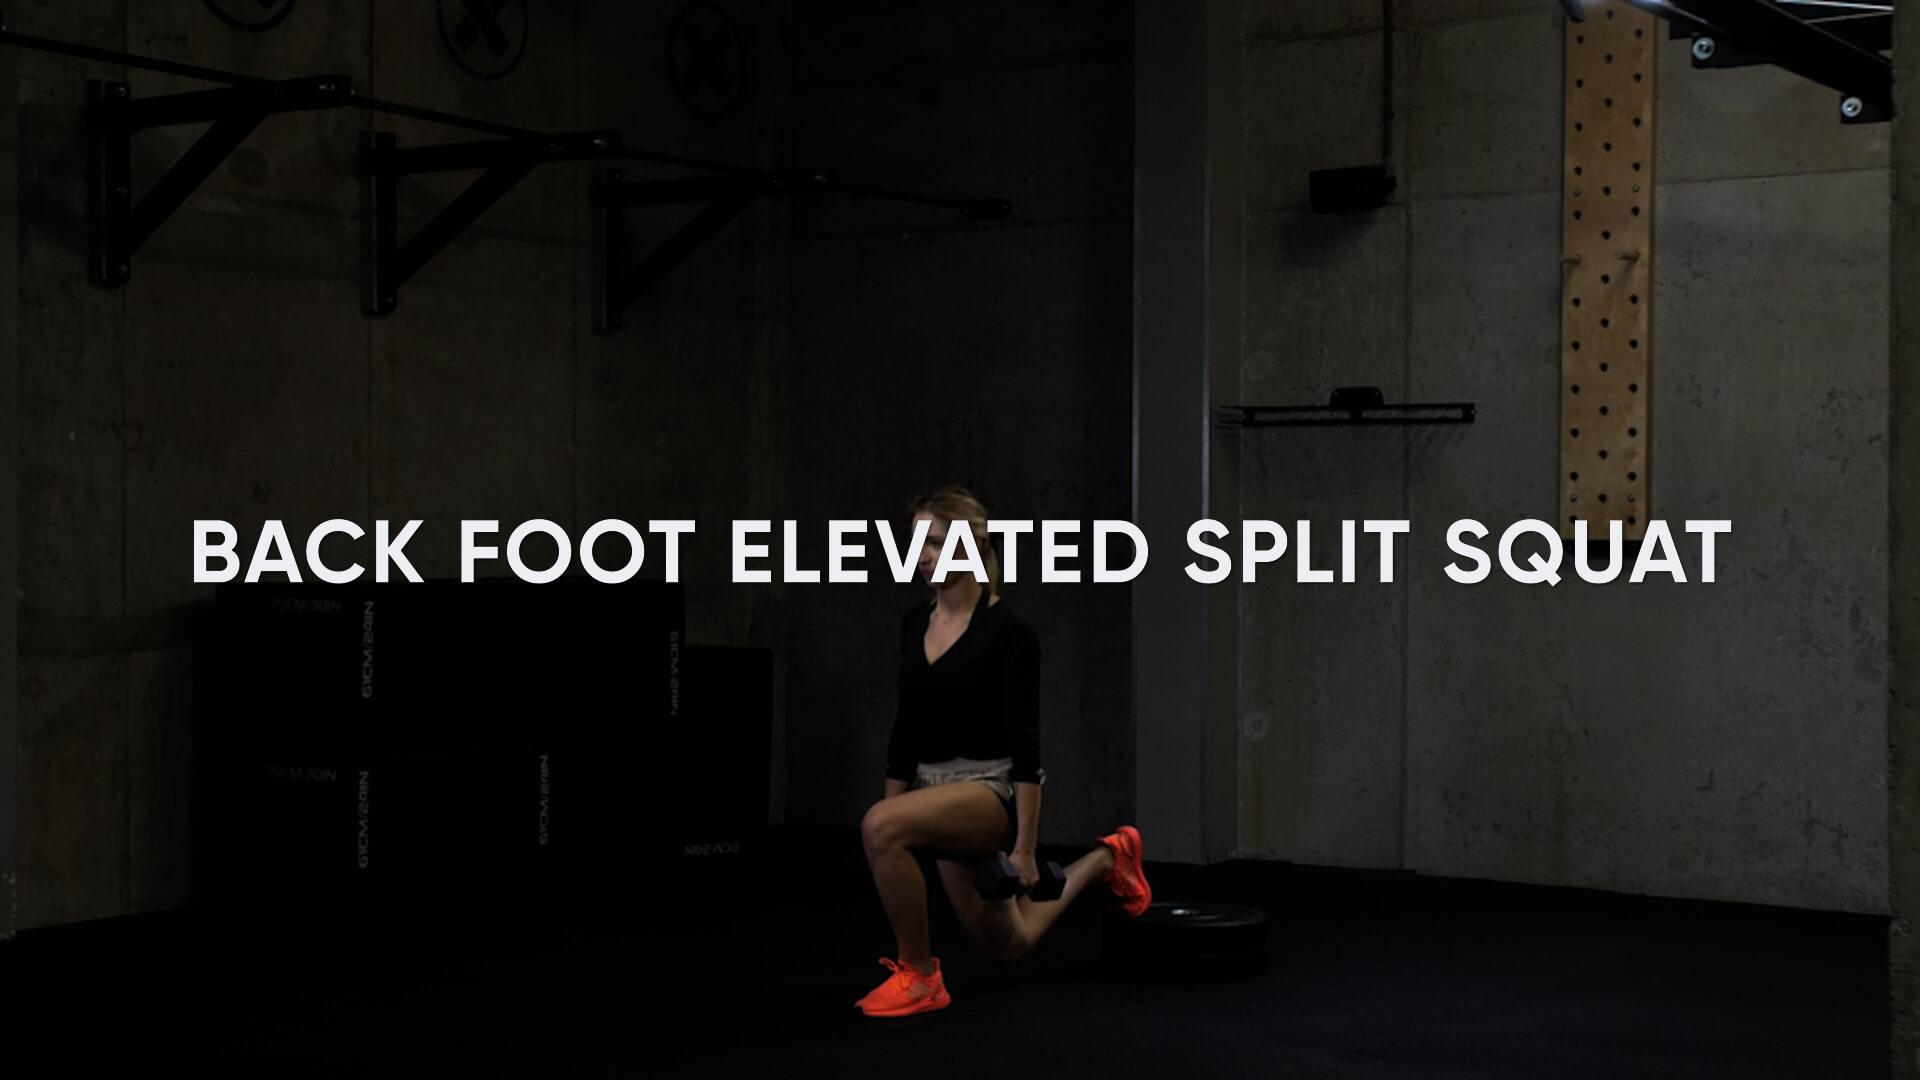 Back Foot Elevated Split Squat